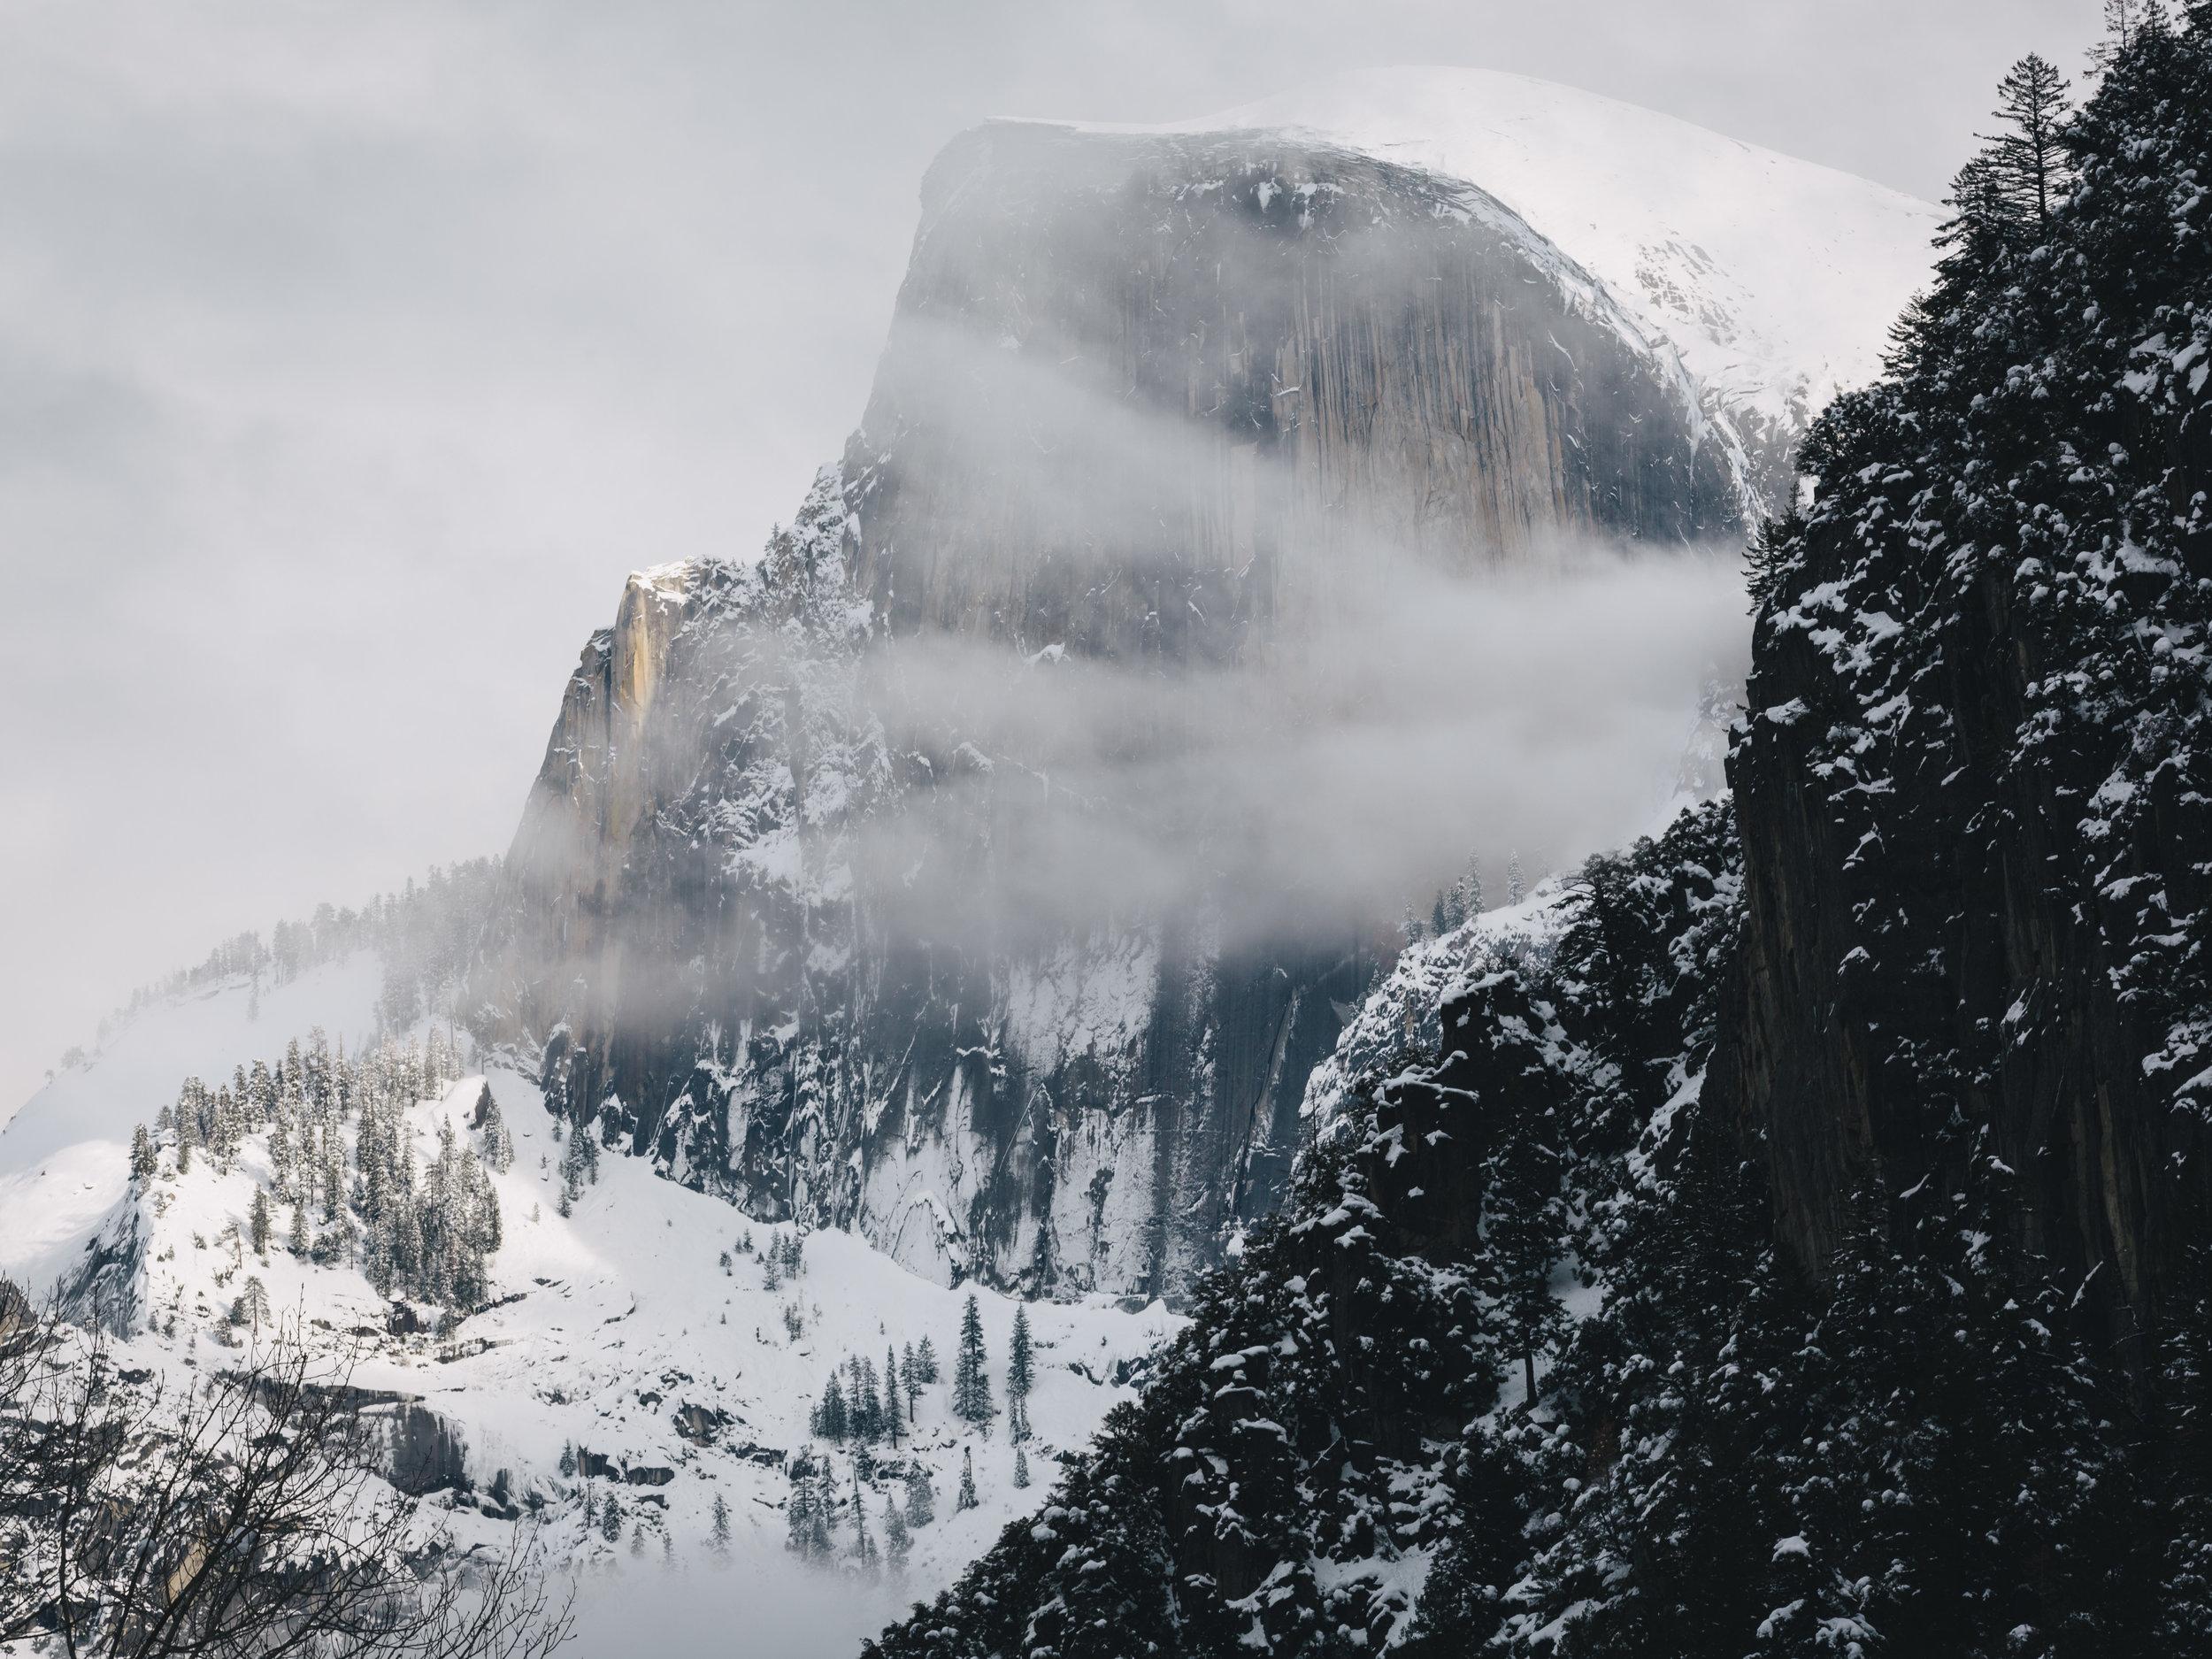 Yosemite_HlafDome2.jpg